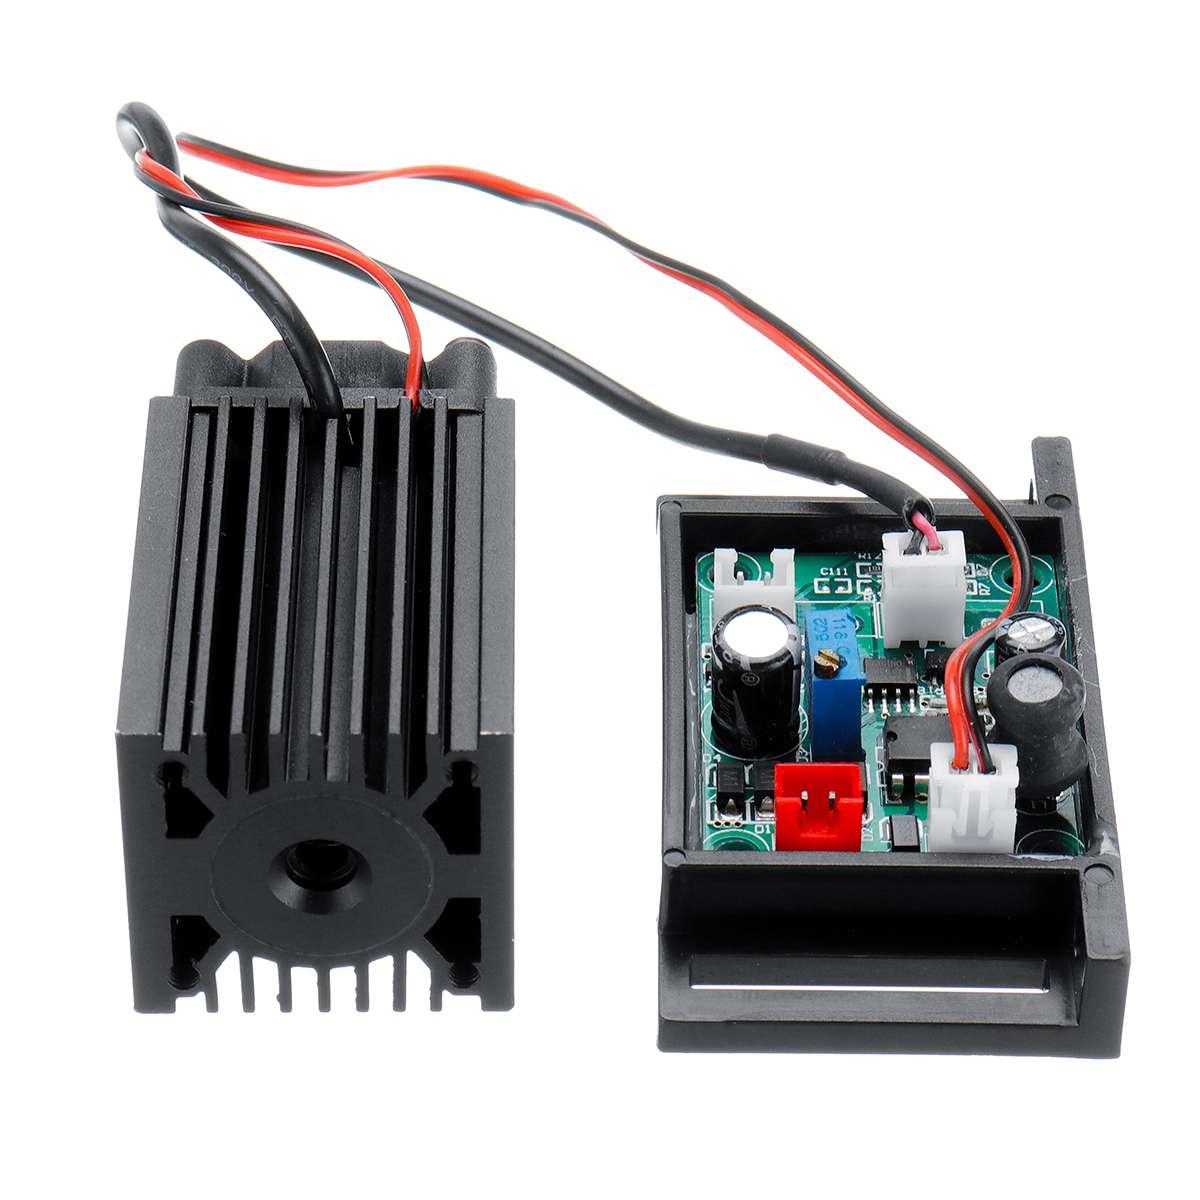 150mW 650nm 655nm 660nm Rot Laser Modul Diode mit 12V TTL Für CNC Laser Carving Gravur Maschine